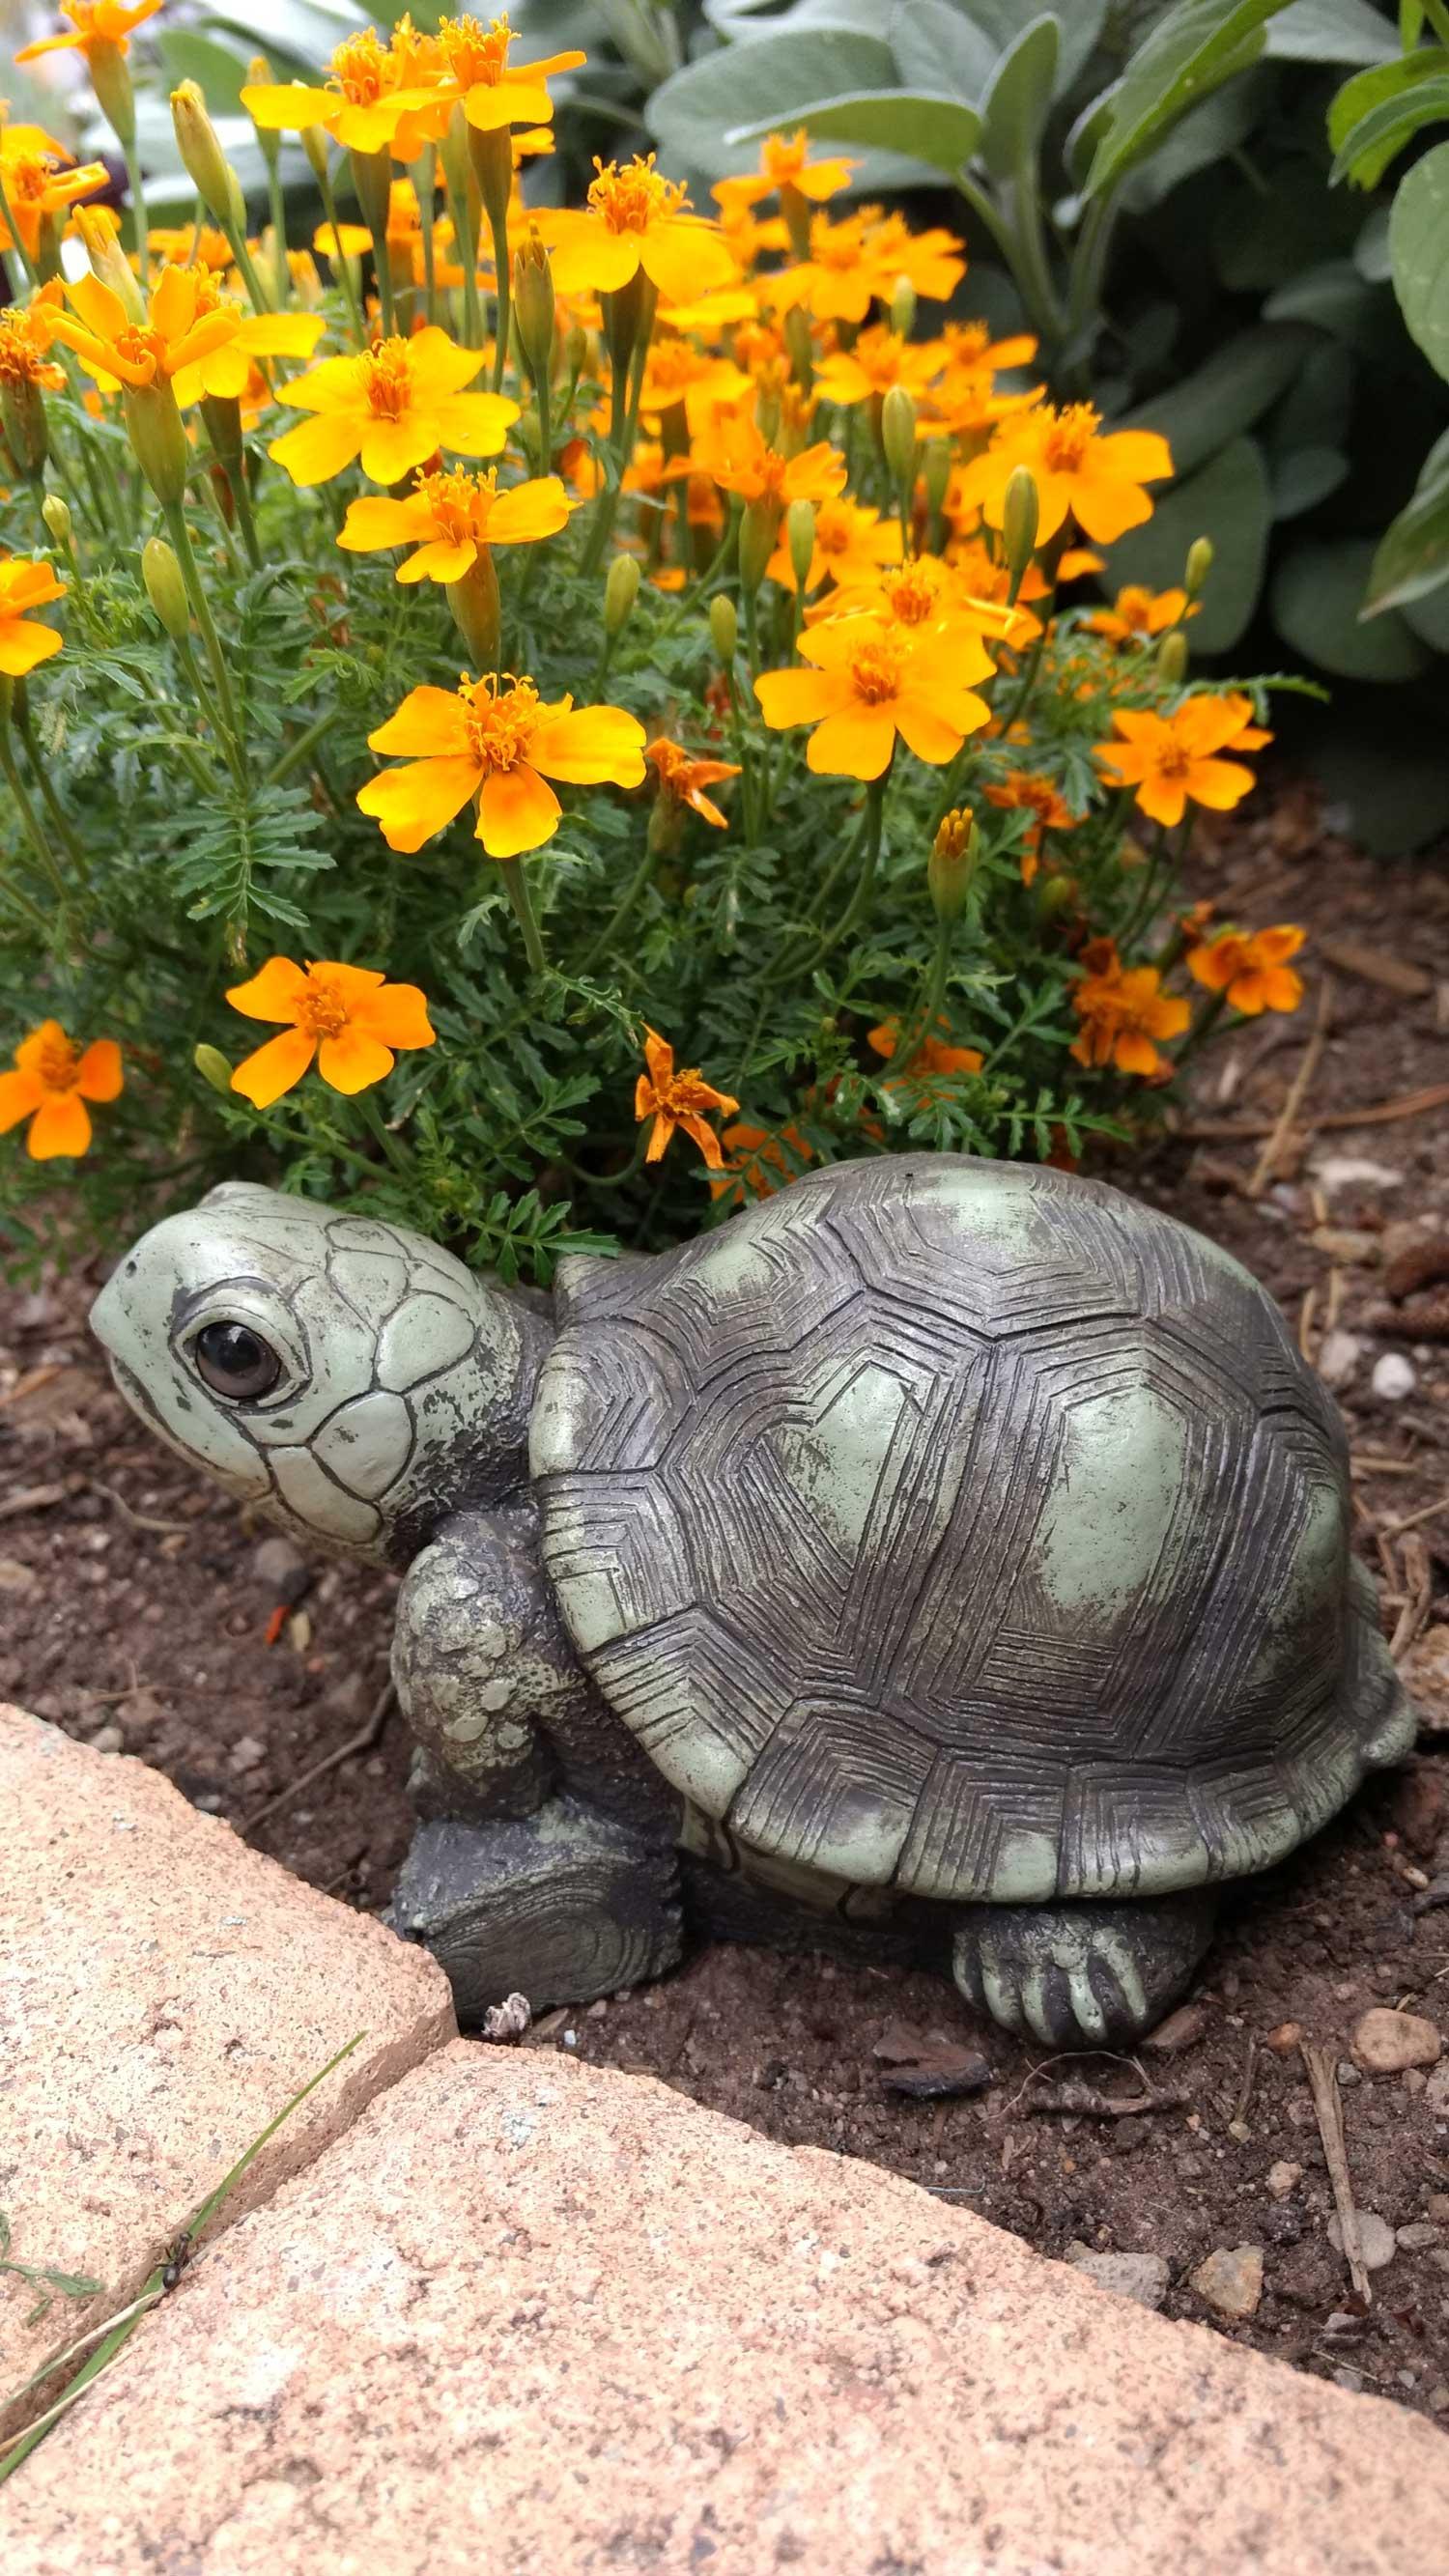 turtle-orange-flowers-12.jpg